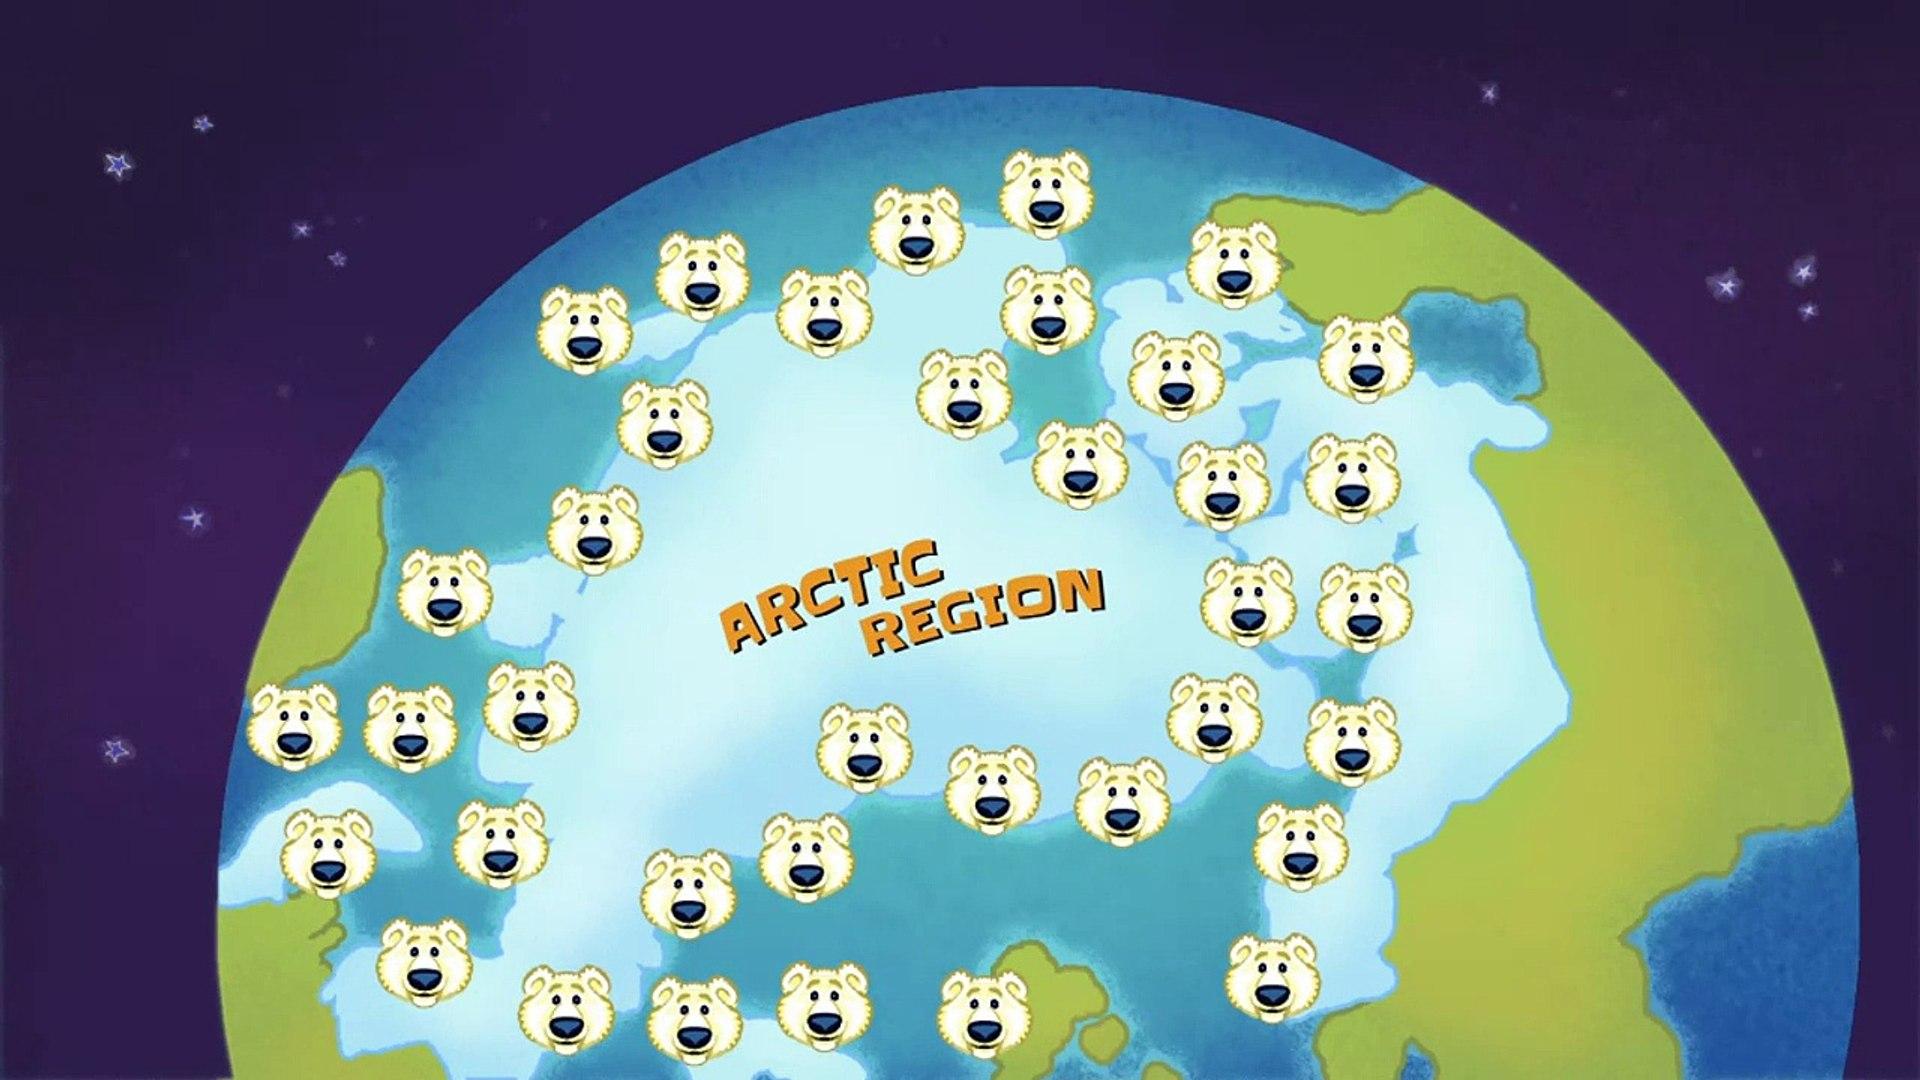 Discovery Education Kids - Polar Bears Rescue 2016-Jsr0s-0mQJY